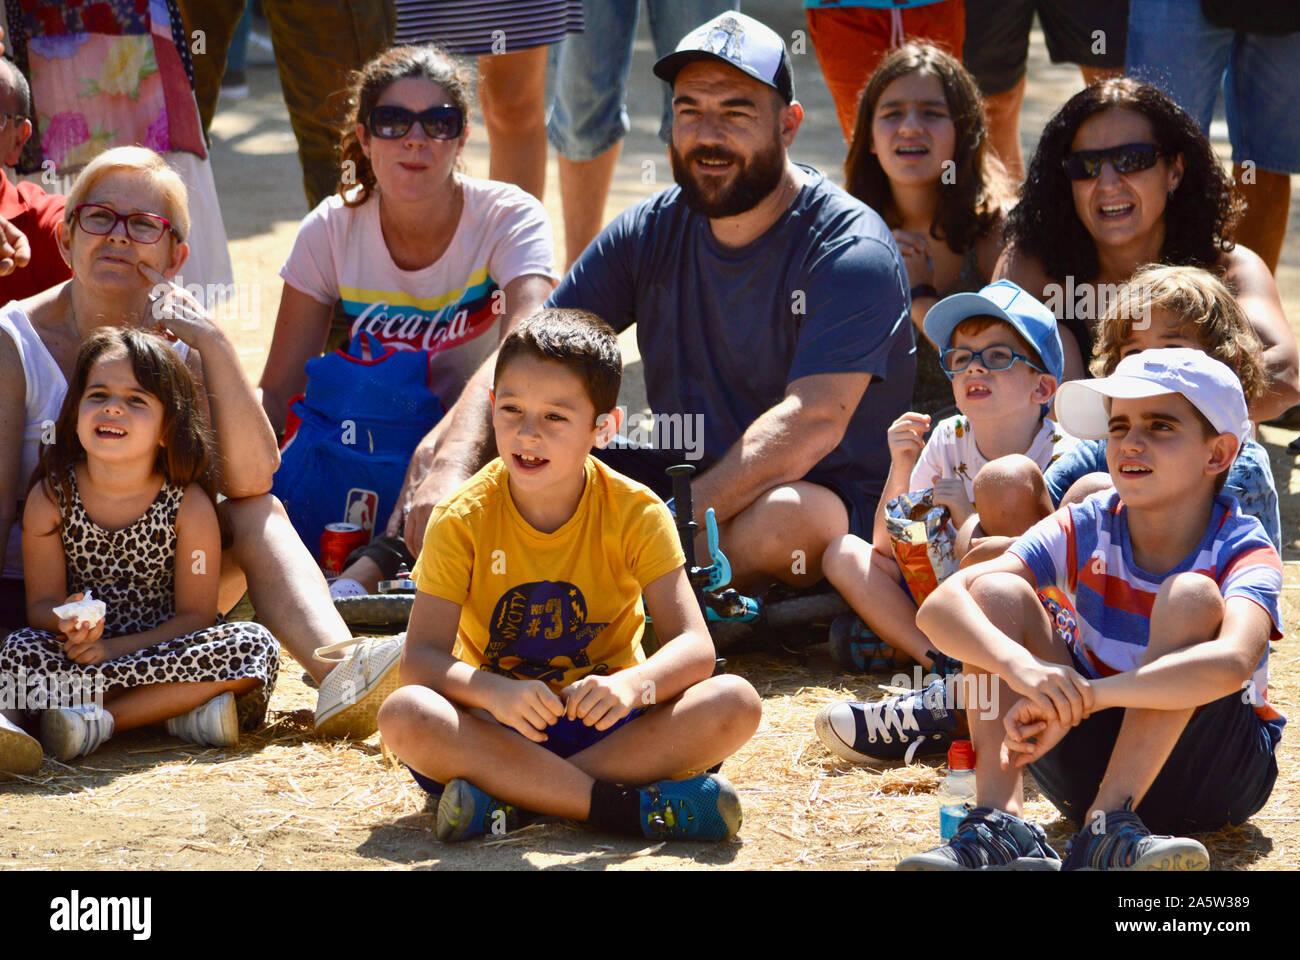 Les enfants de regarder un artiste de rue au Parc de la Ciutadella durant la Merce 2019 à Barcelone, Espagne Banque D'Images